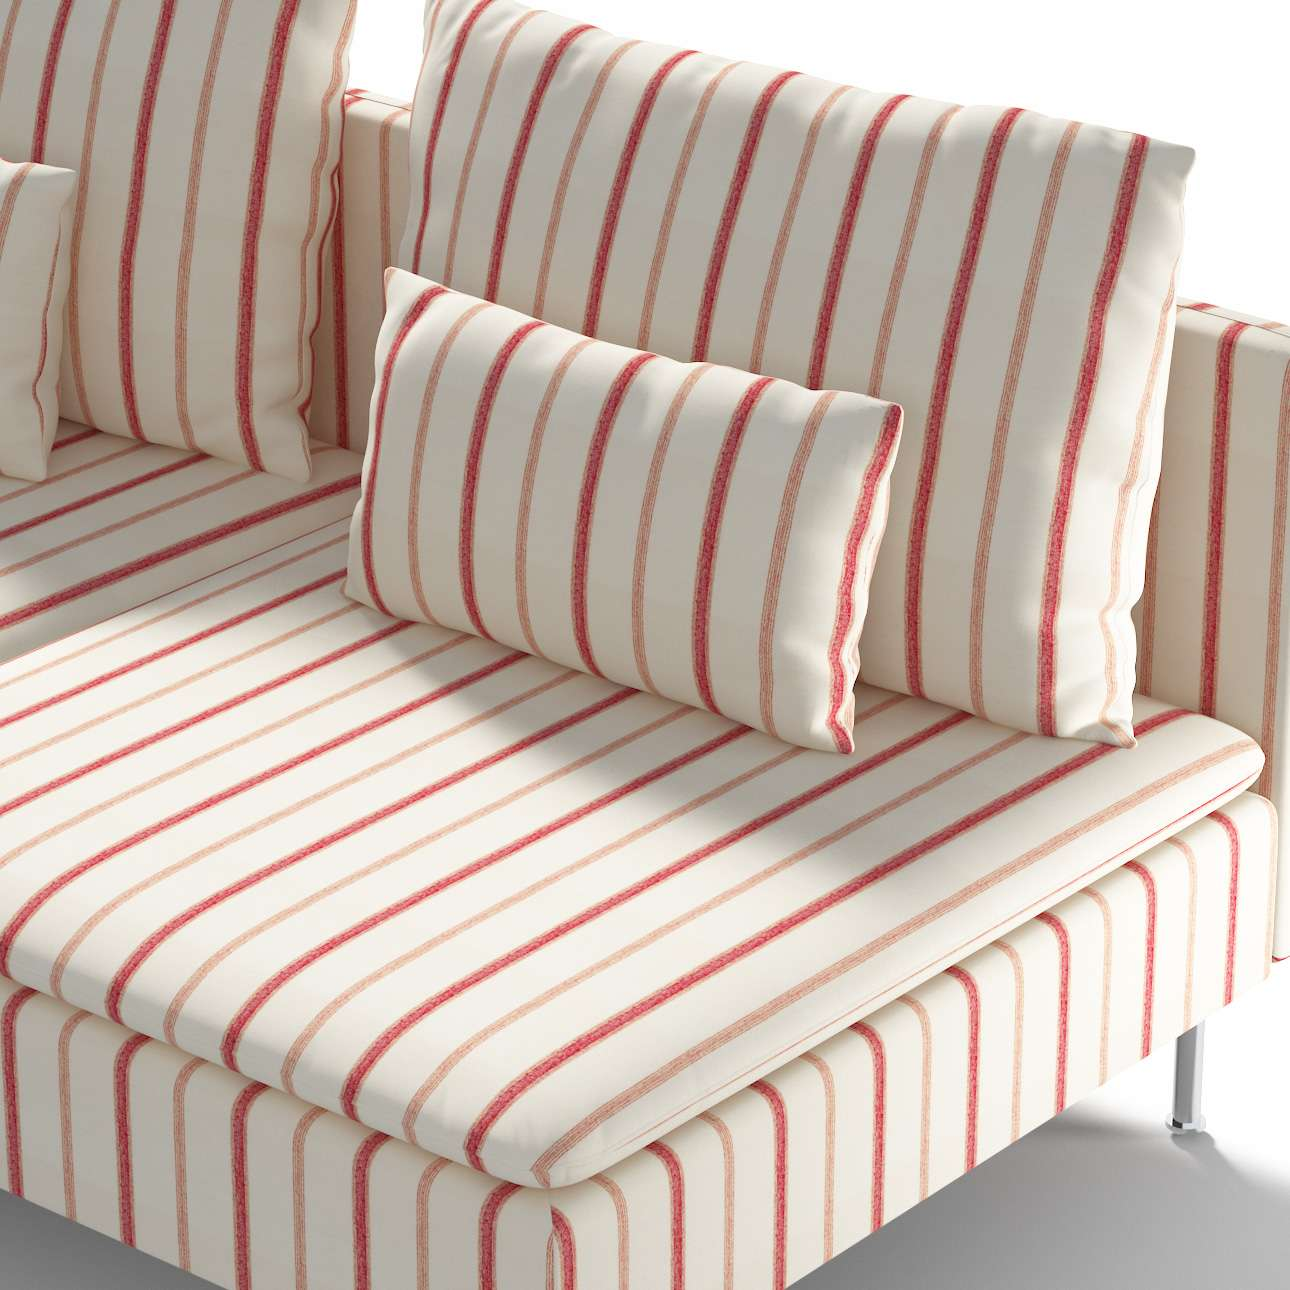 Söderhamn 3-seater section Söderhamn 3-seater section cover in collection Avinon, fabric: 129-15